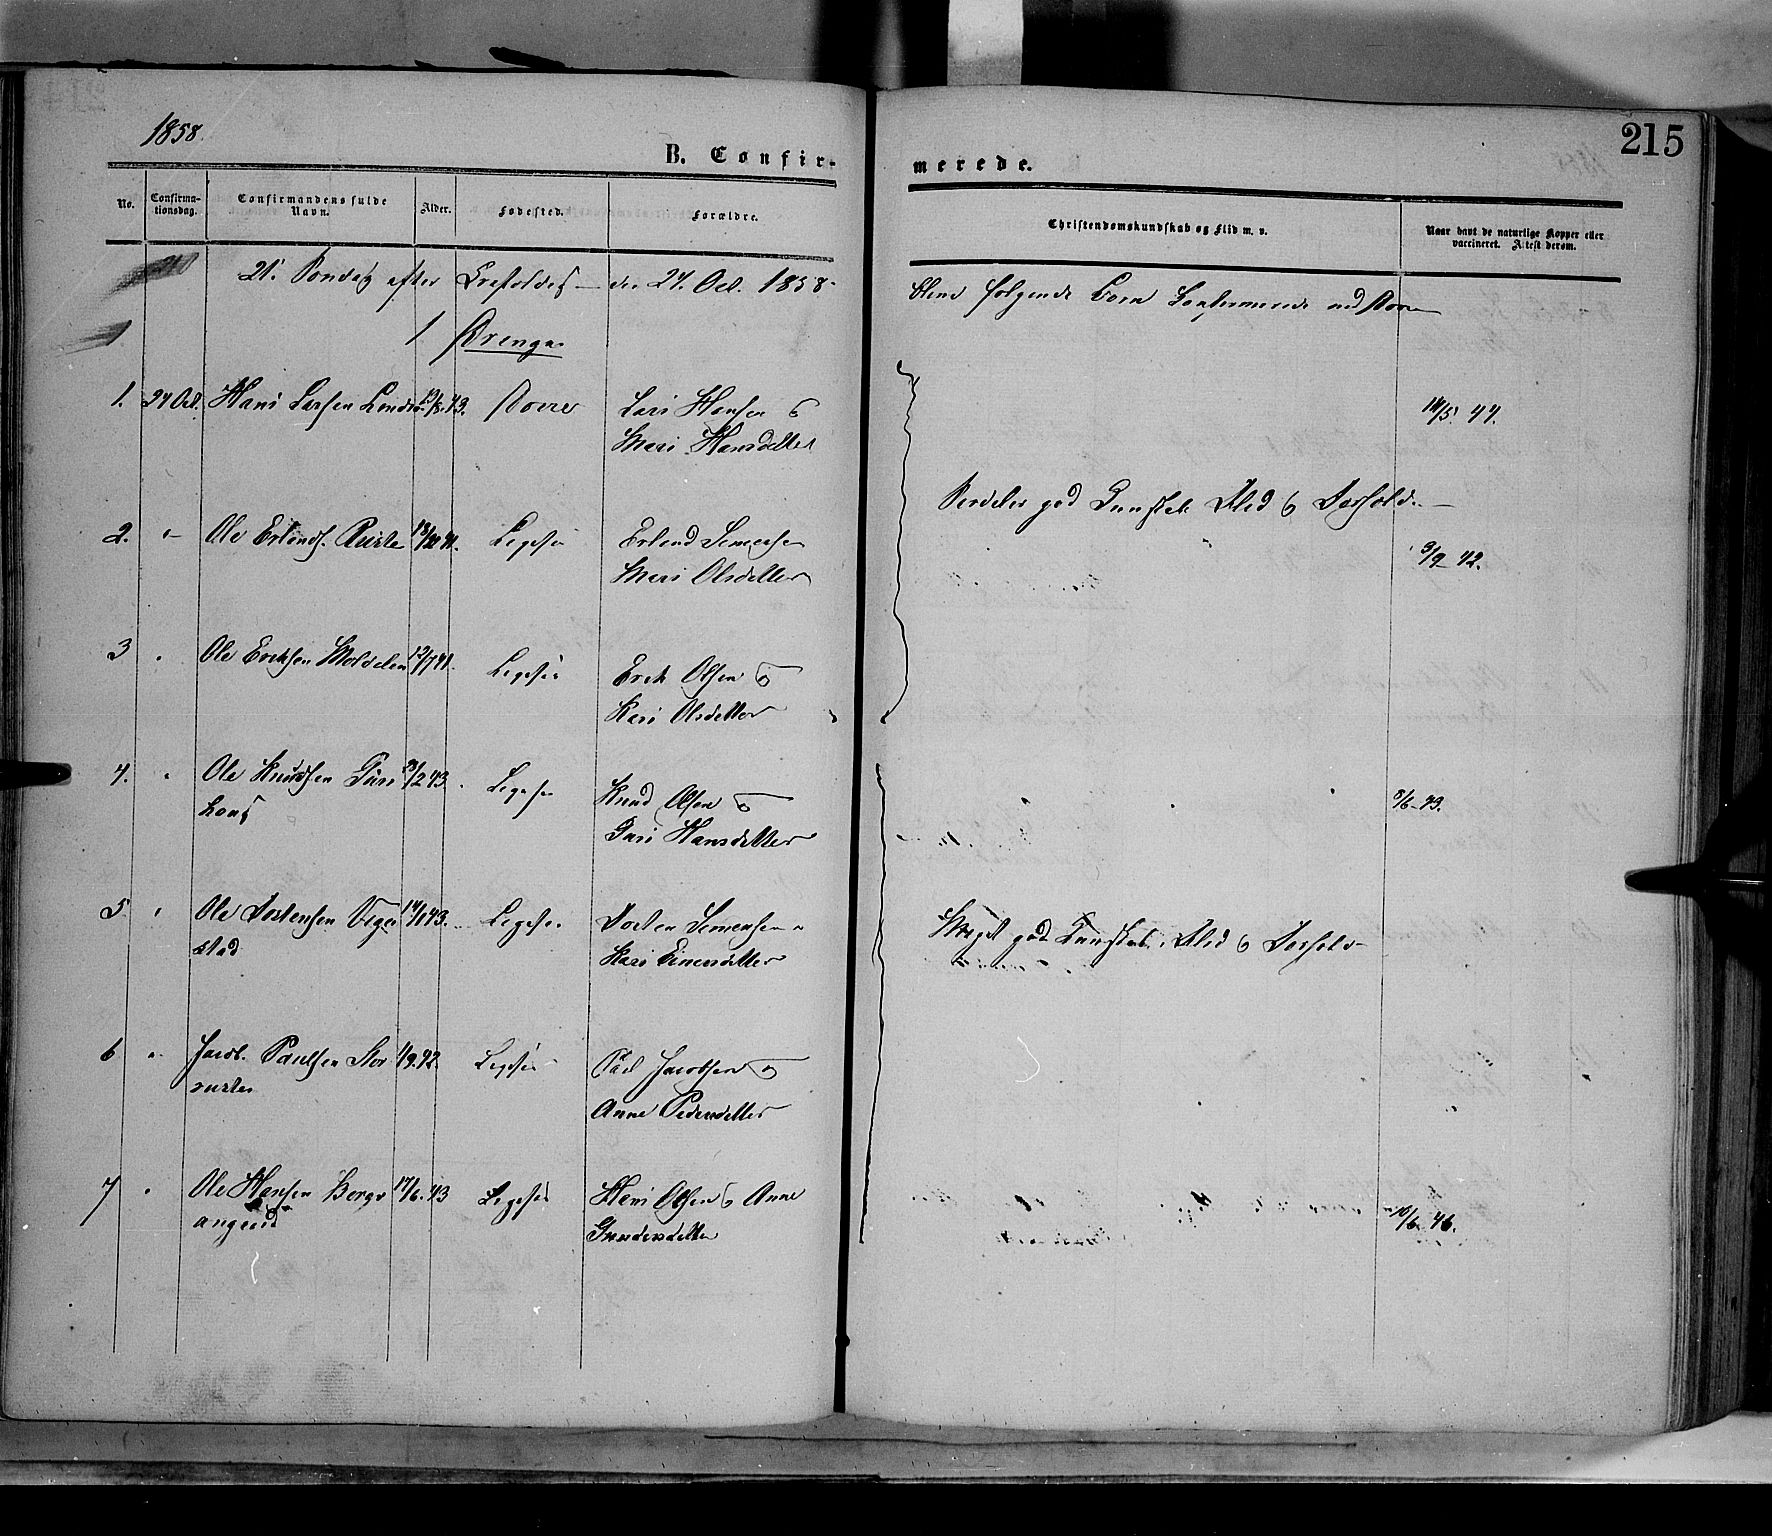 SAH, Dovre prestekontor, Ministerialbok nr. 1, 1854-1878, s. 215